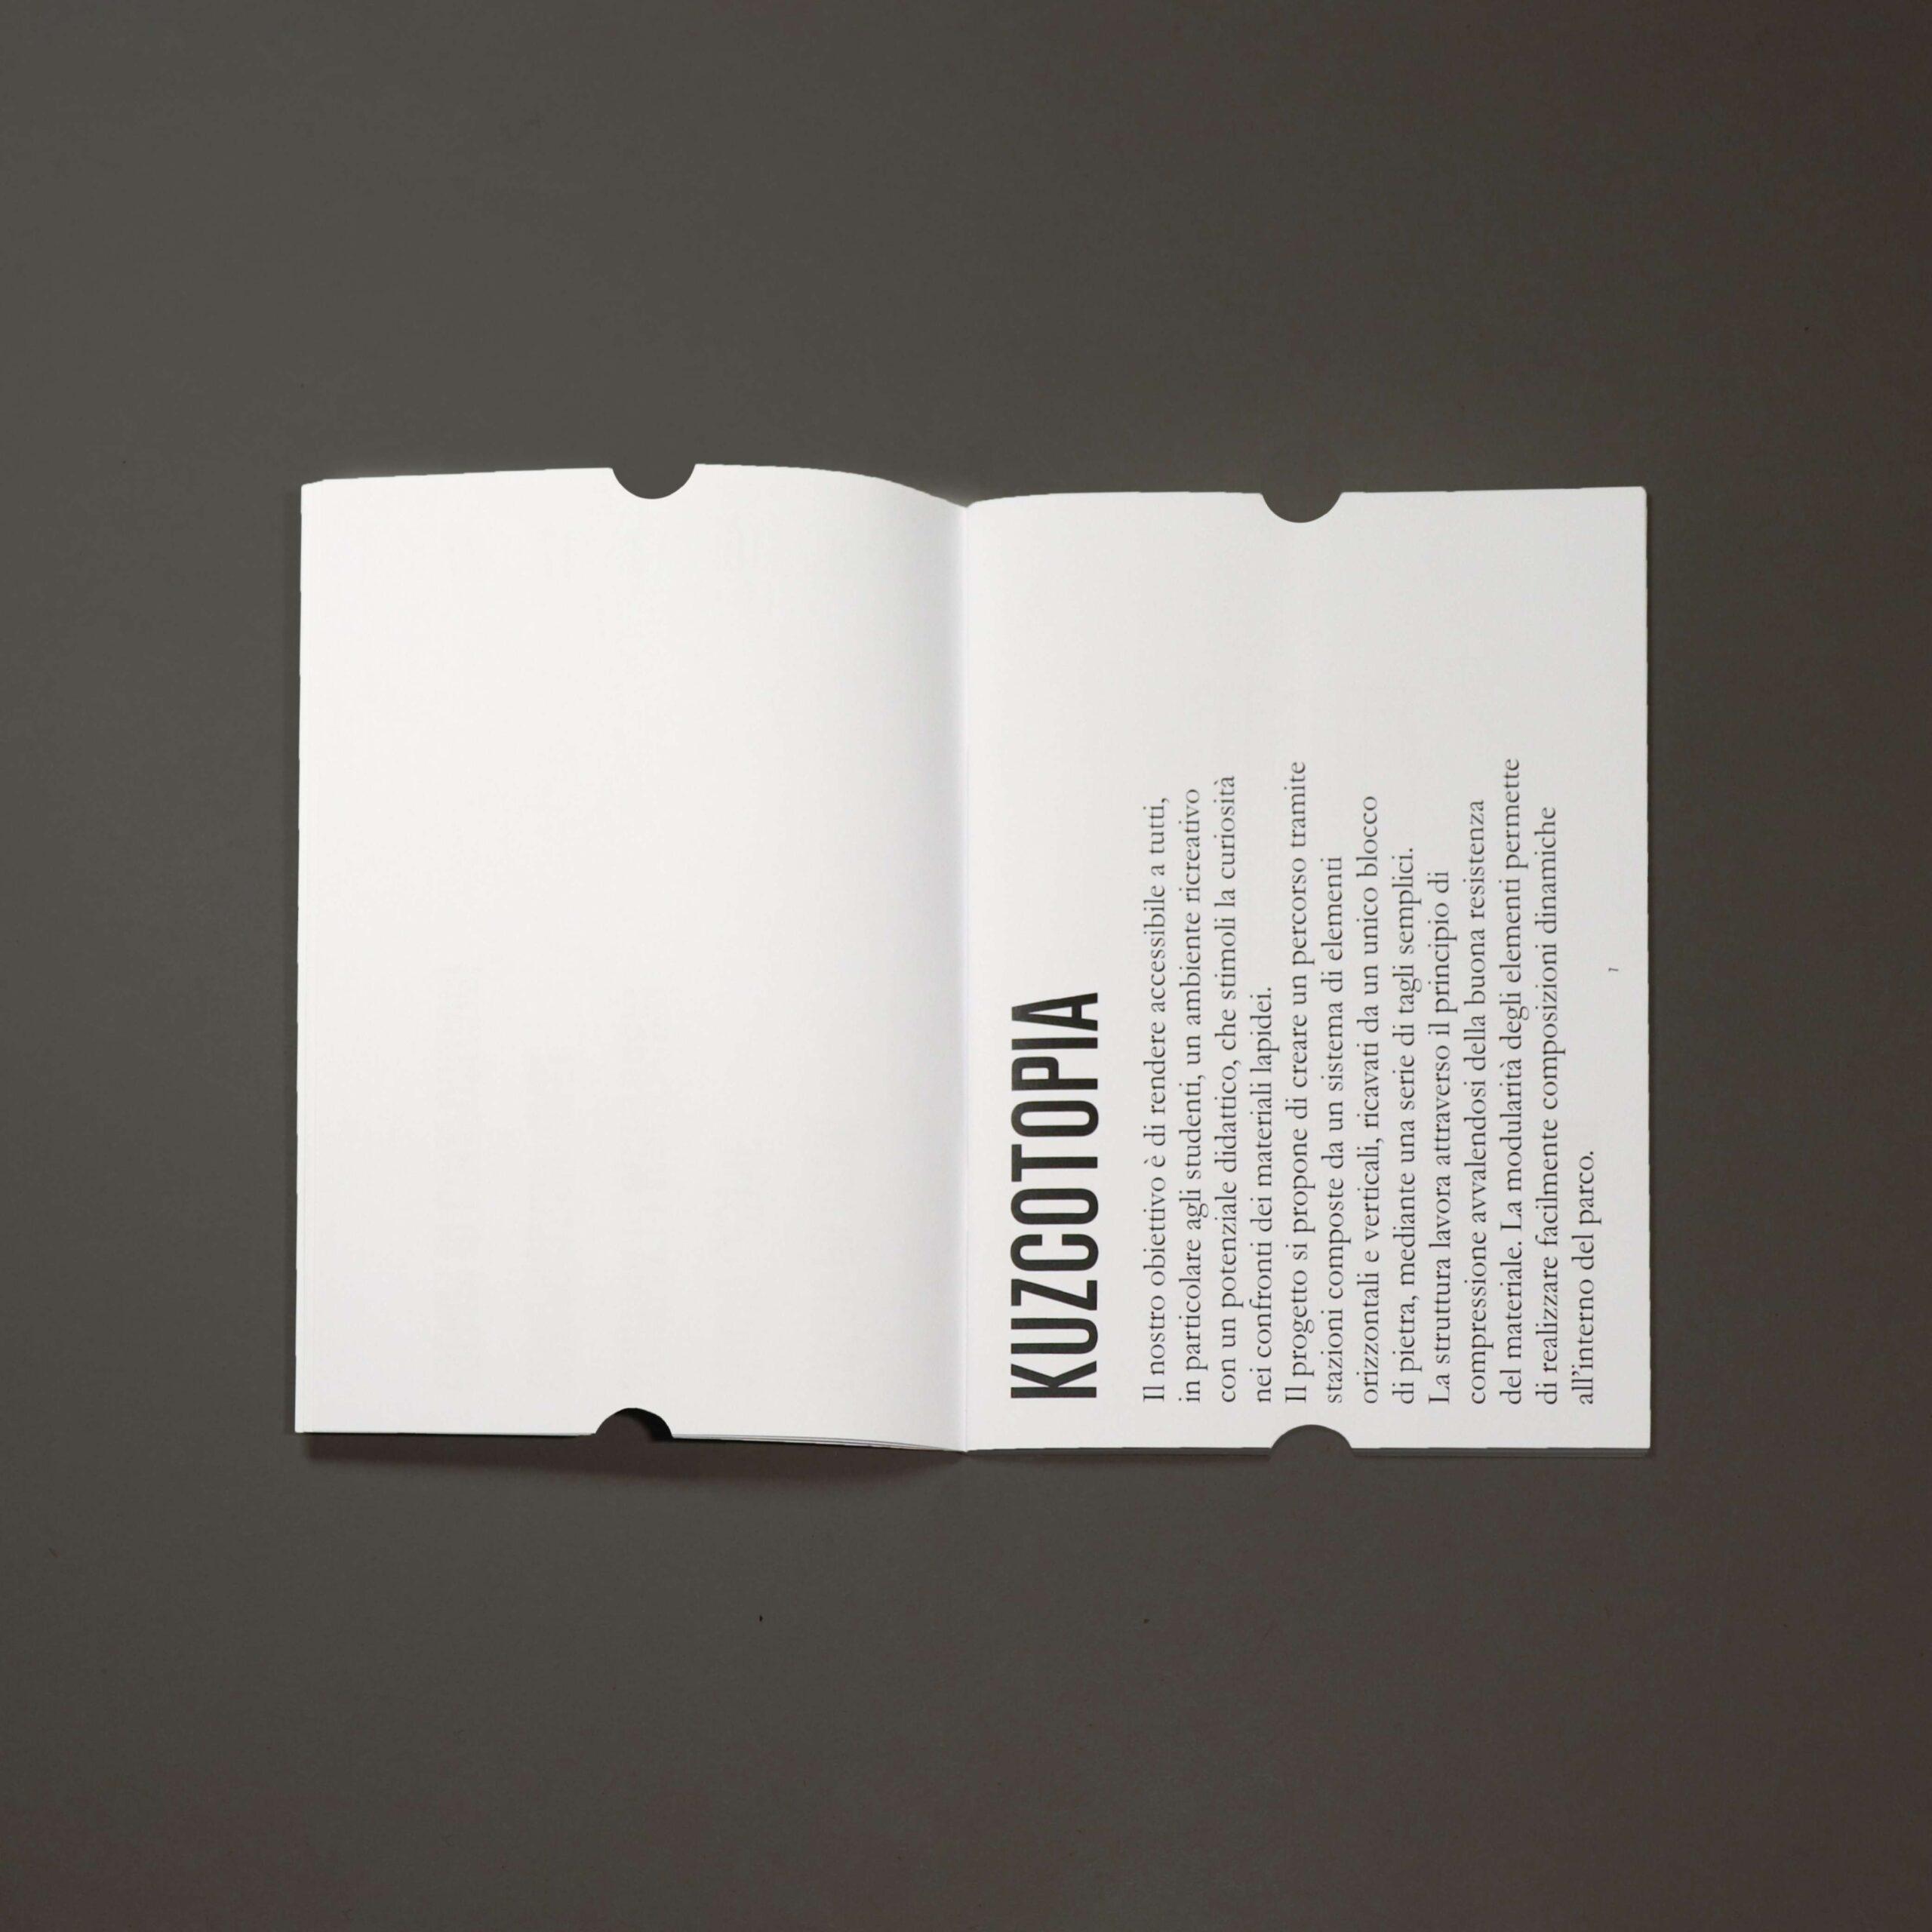 Catalogo Kuzkotopia 3